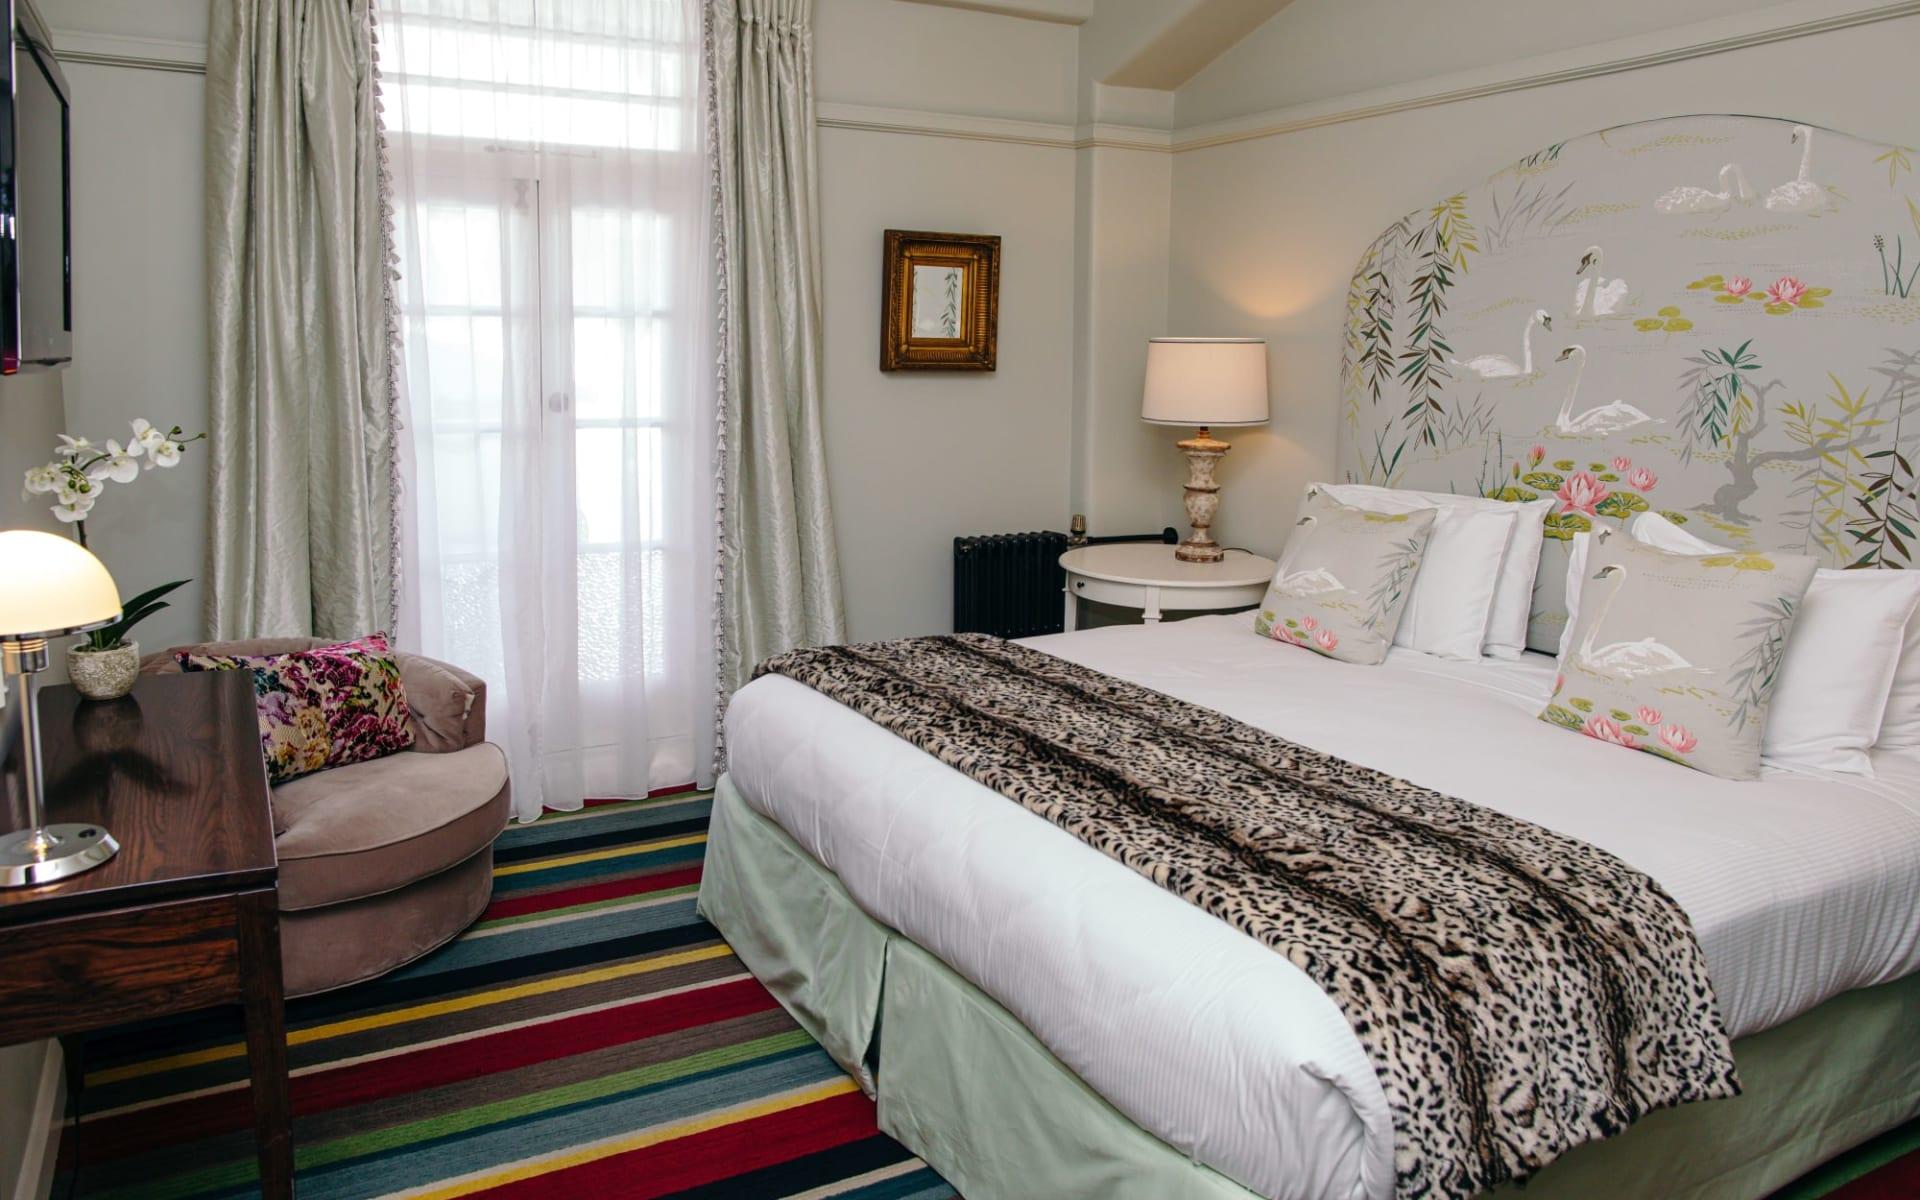 Art Deco Masonic Hotel in Napier:  Anna-Pavlova-Suite-Art-Deco-Masonic-Hotel-Rooms-May-2019-11